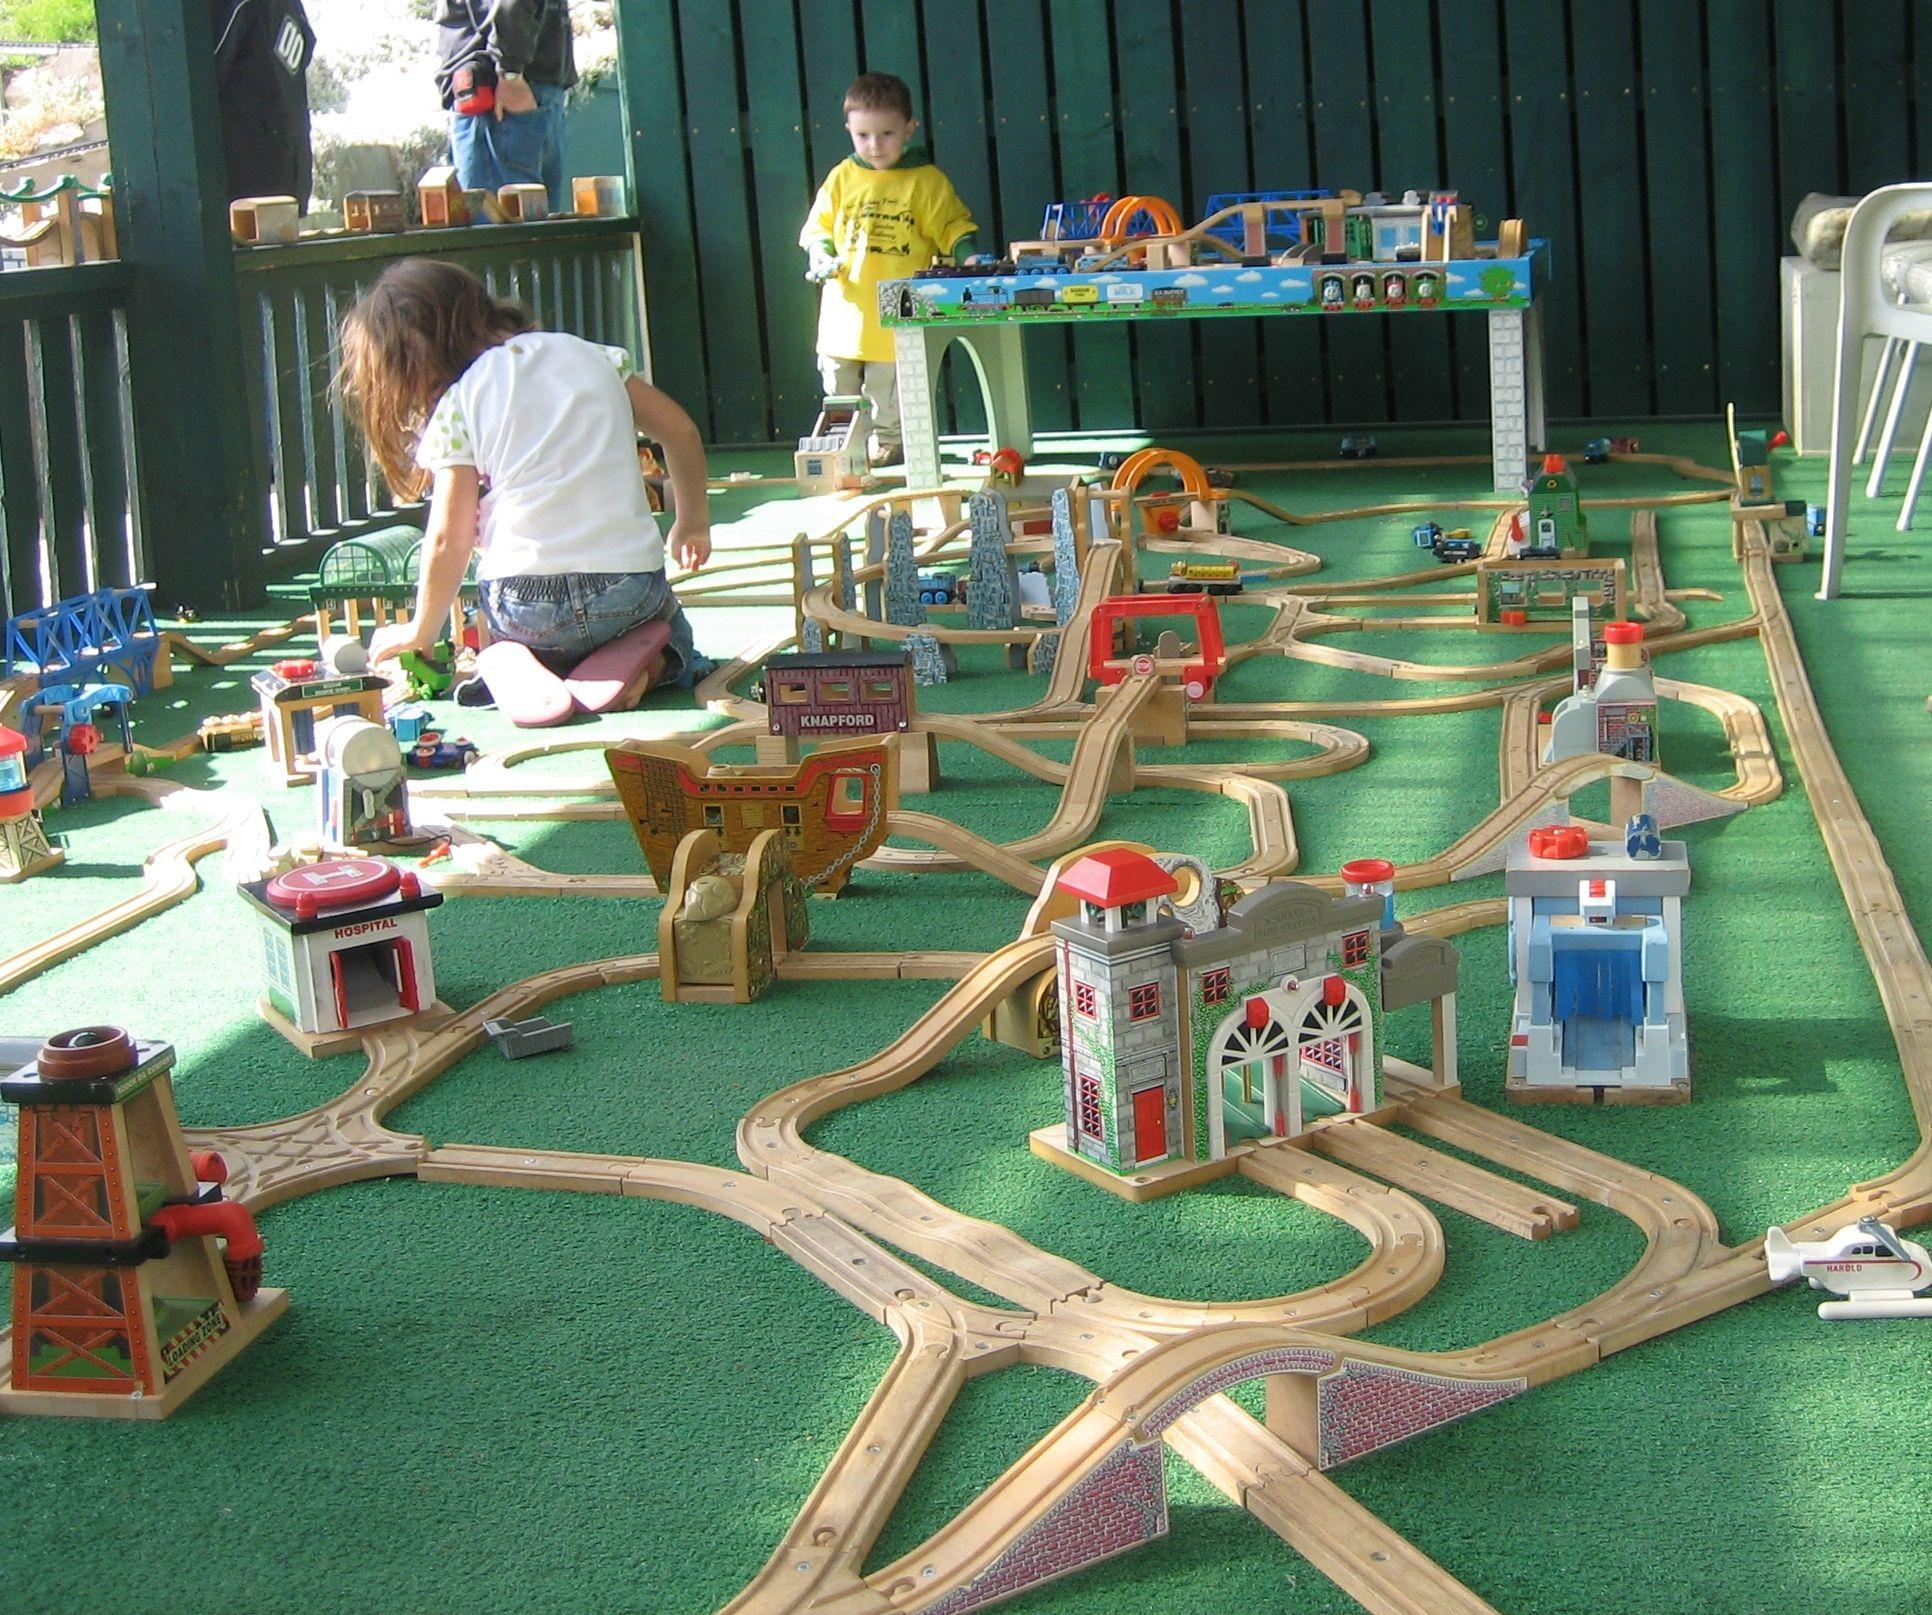 A Thomas train layout at Big Sky Garden Railway in Nanton Alberta